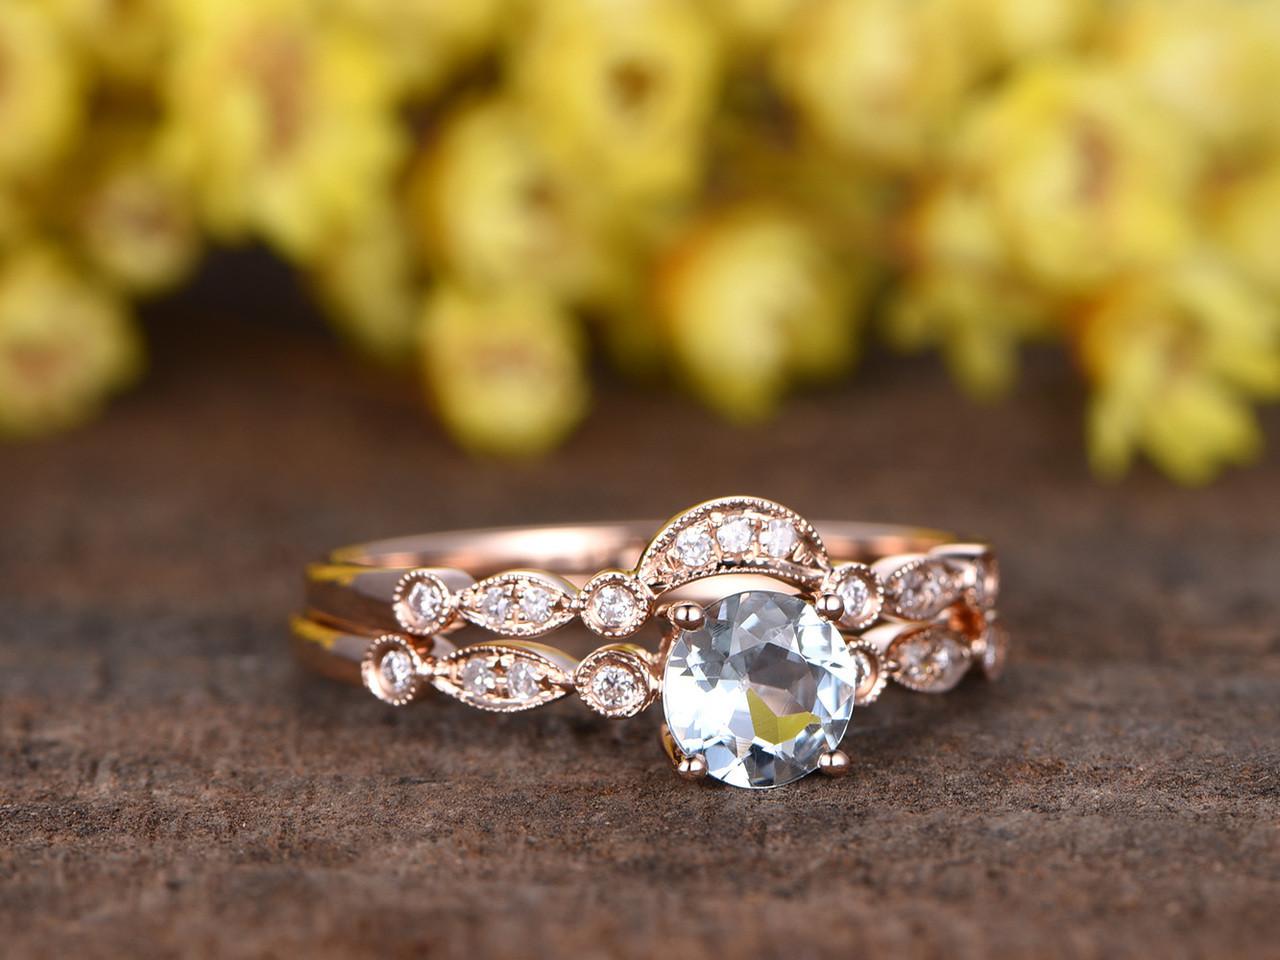 aquamarine wedding set aquamarine wedding rings 0 5 Carat Round Aquamarine Bridal Set Diamond Wedding Ring 14k Rose Gold Art Deco Curve Matching